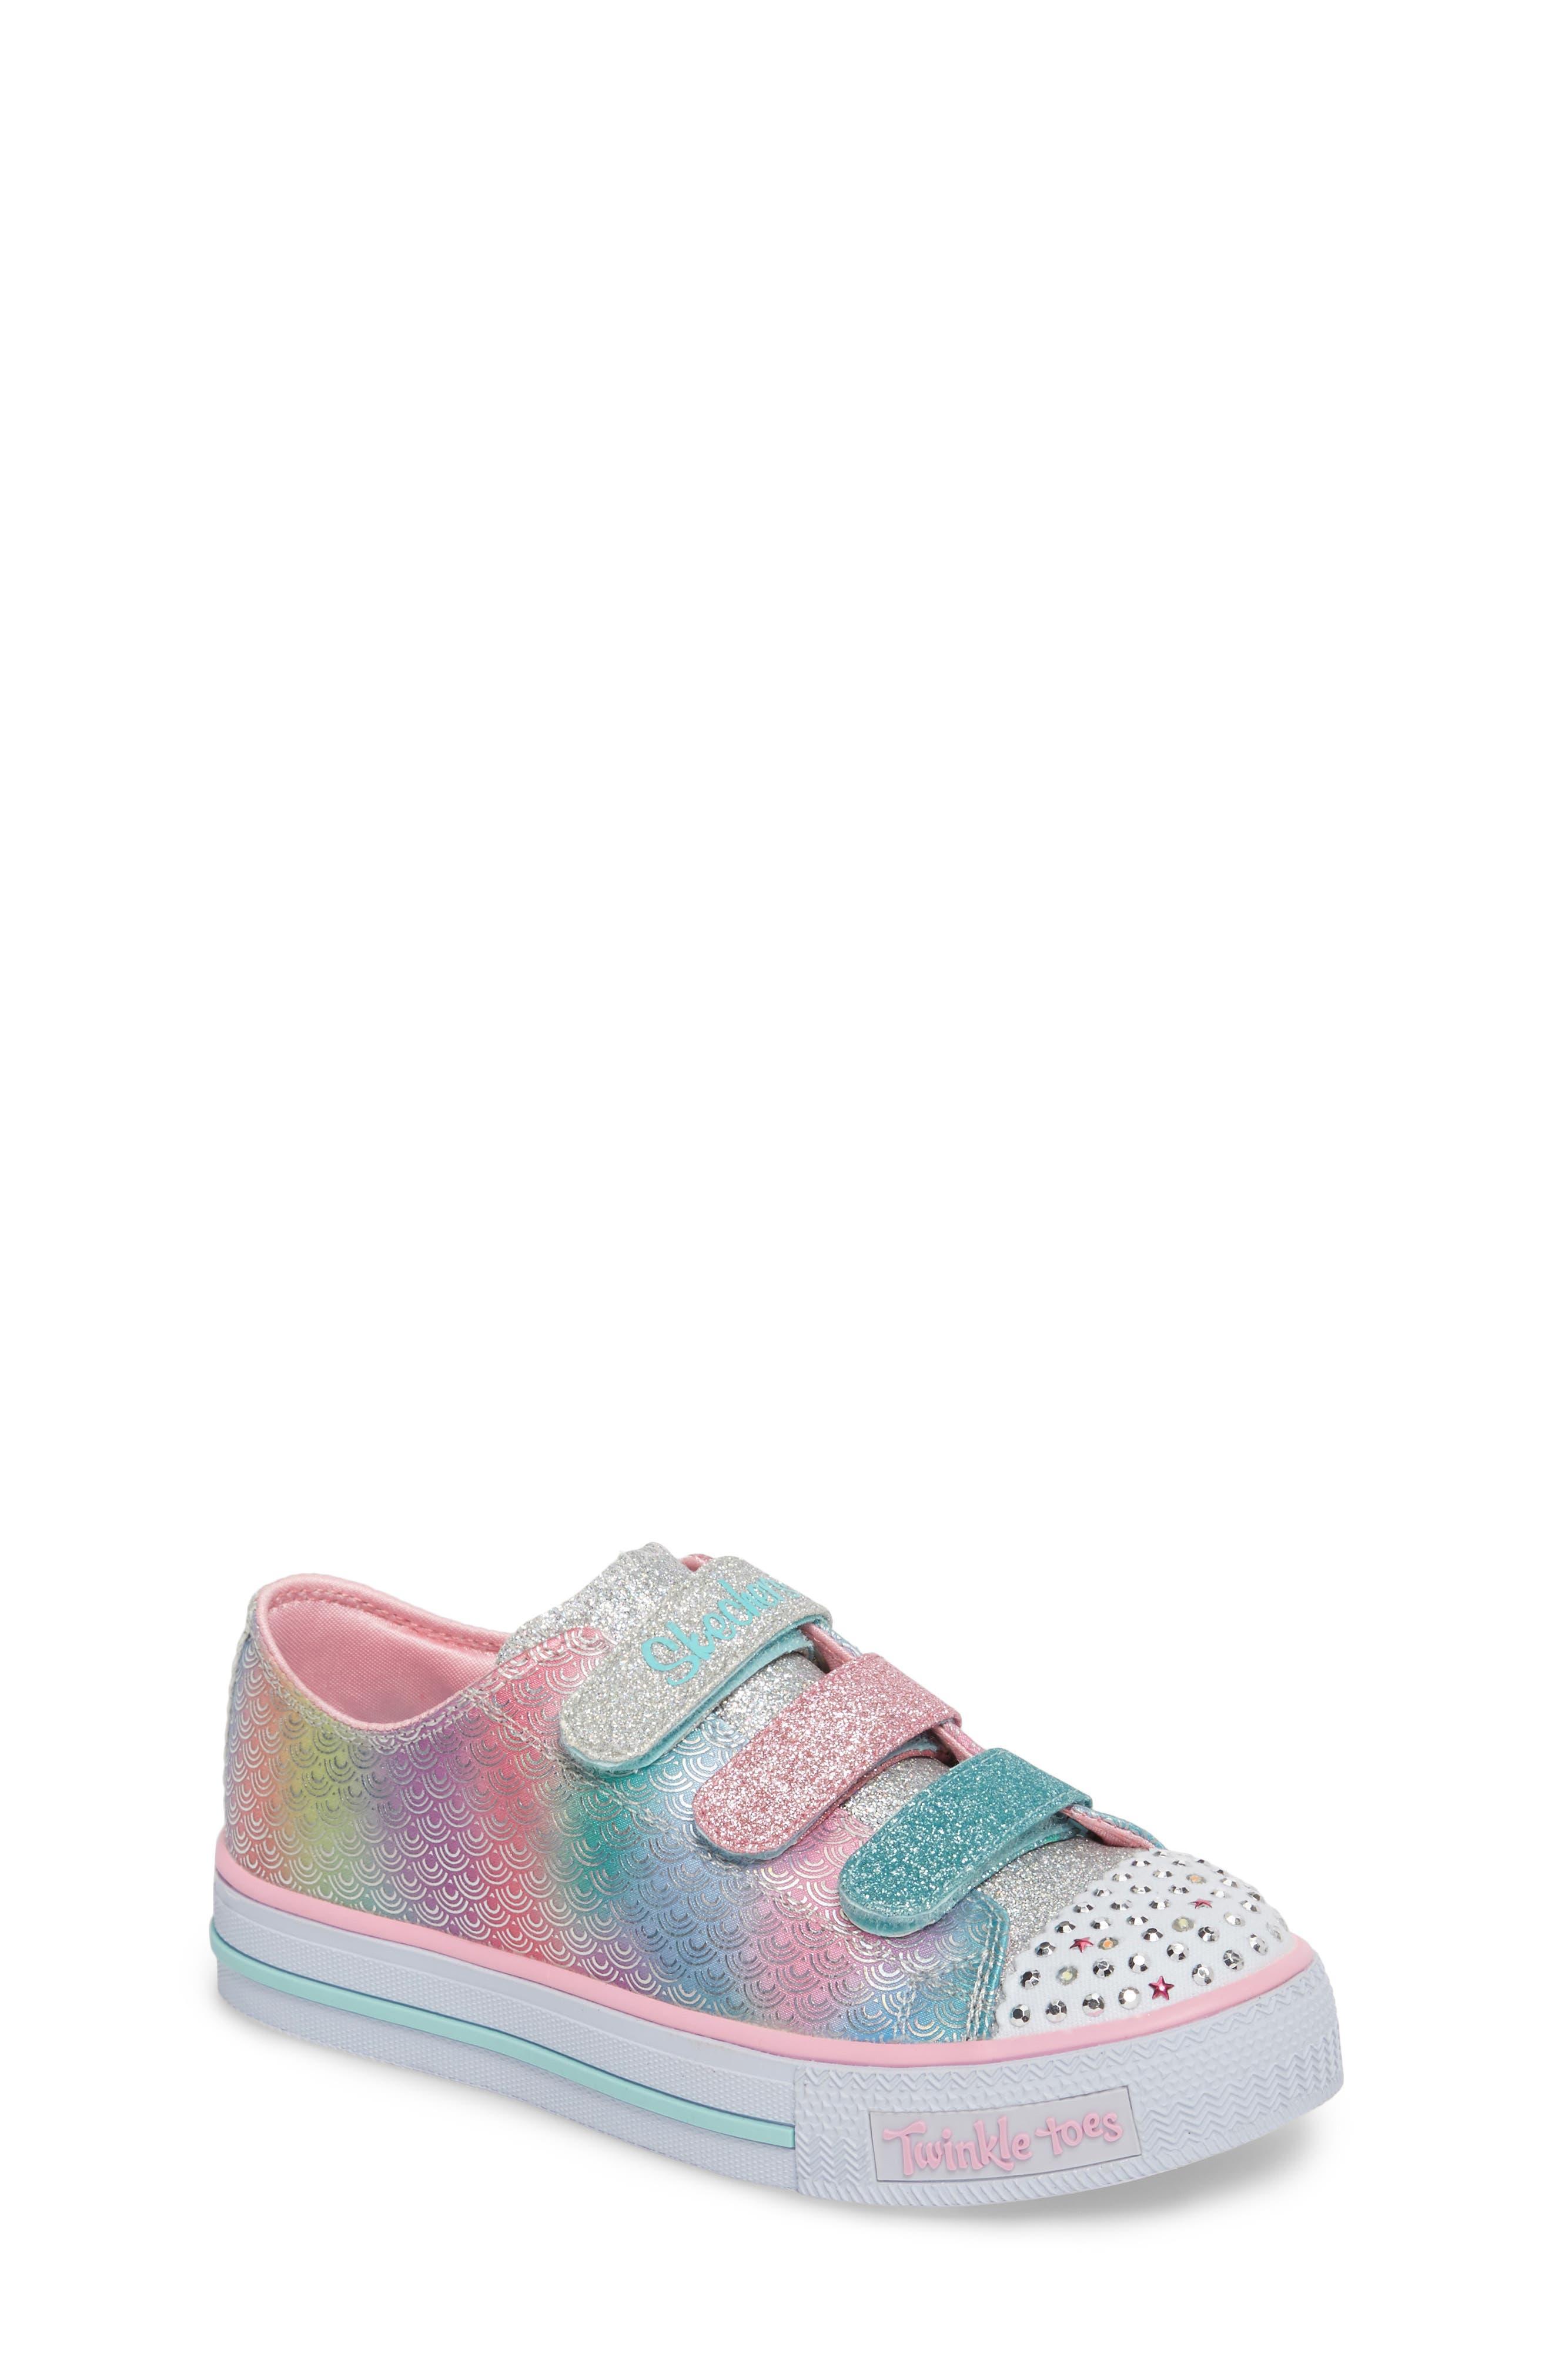 SKECHERS Twinkle Toes Shuffles Glitter Light-Up Sneaker (Toddler, Little Kid & Big Kid)